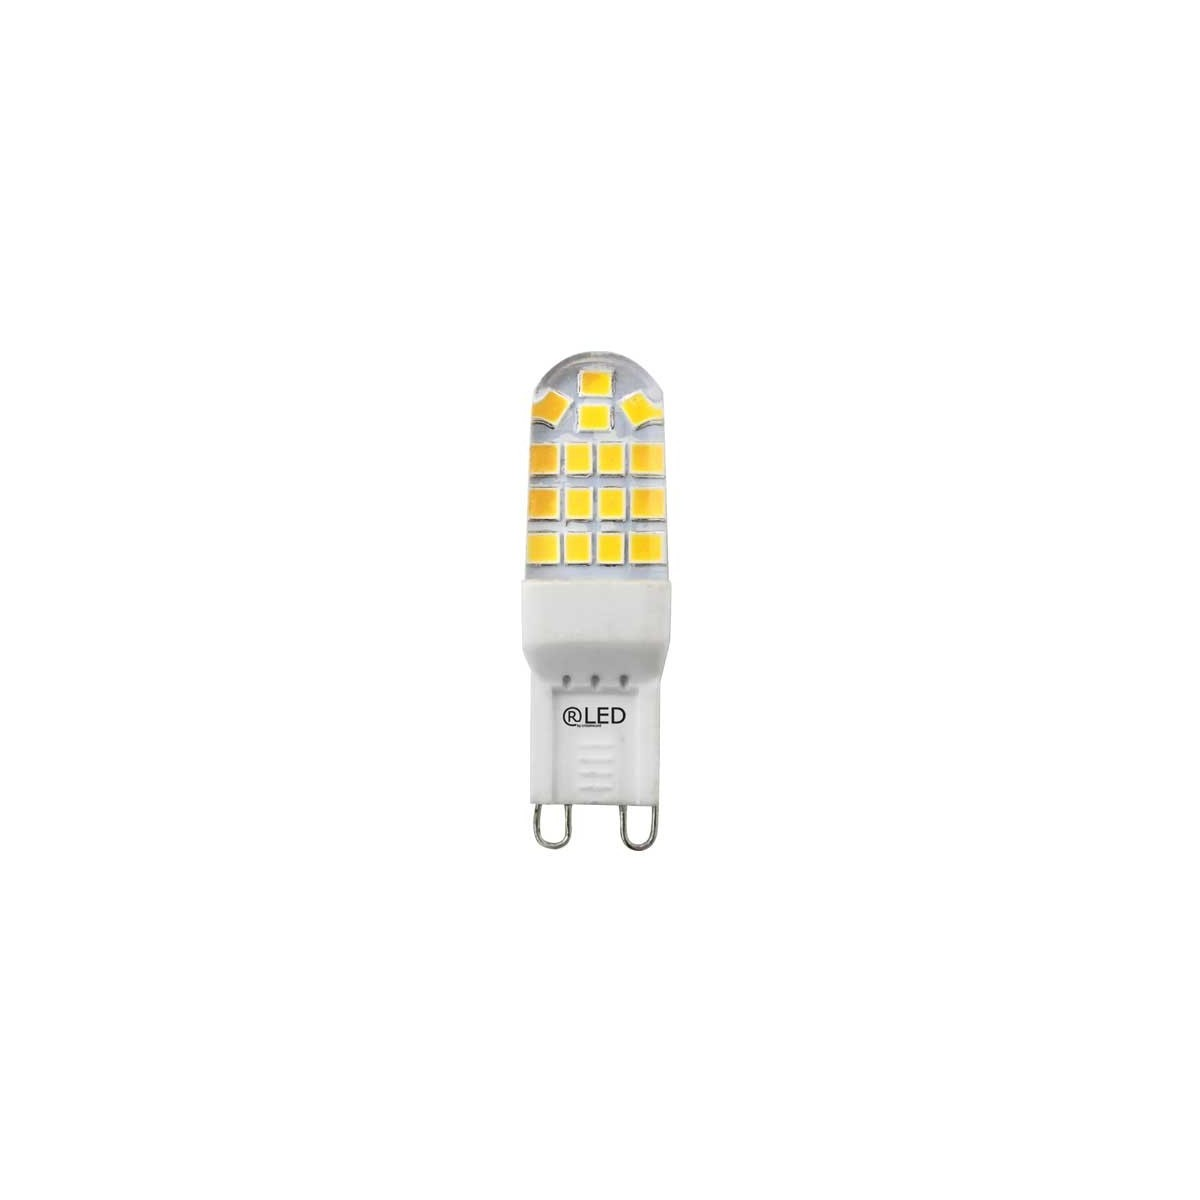 LED G9 2.5W 270LM 4000ºK